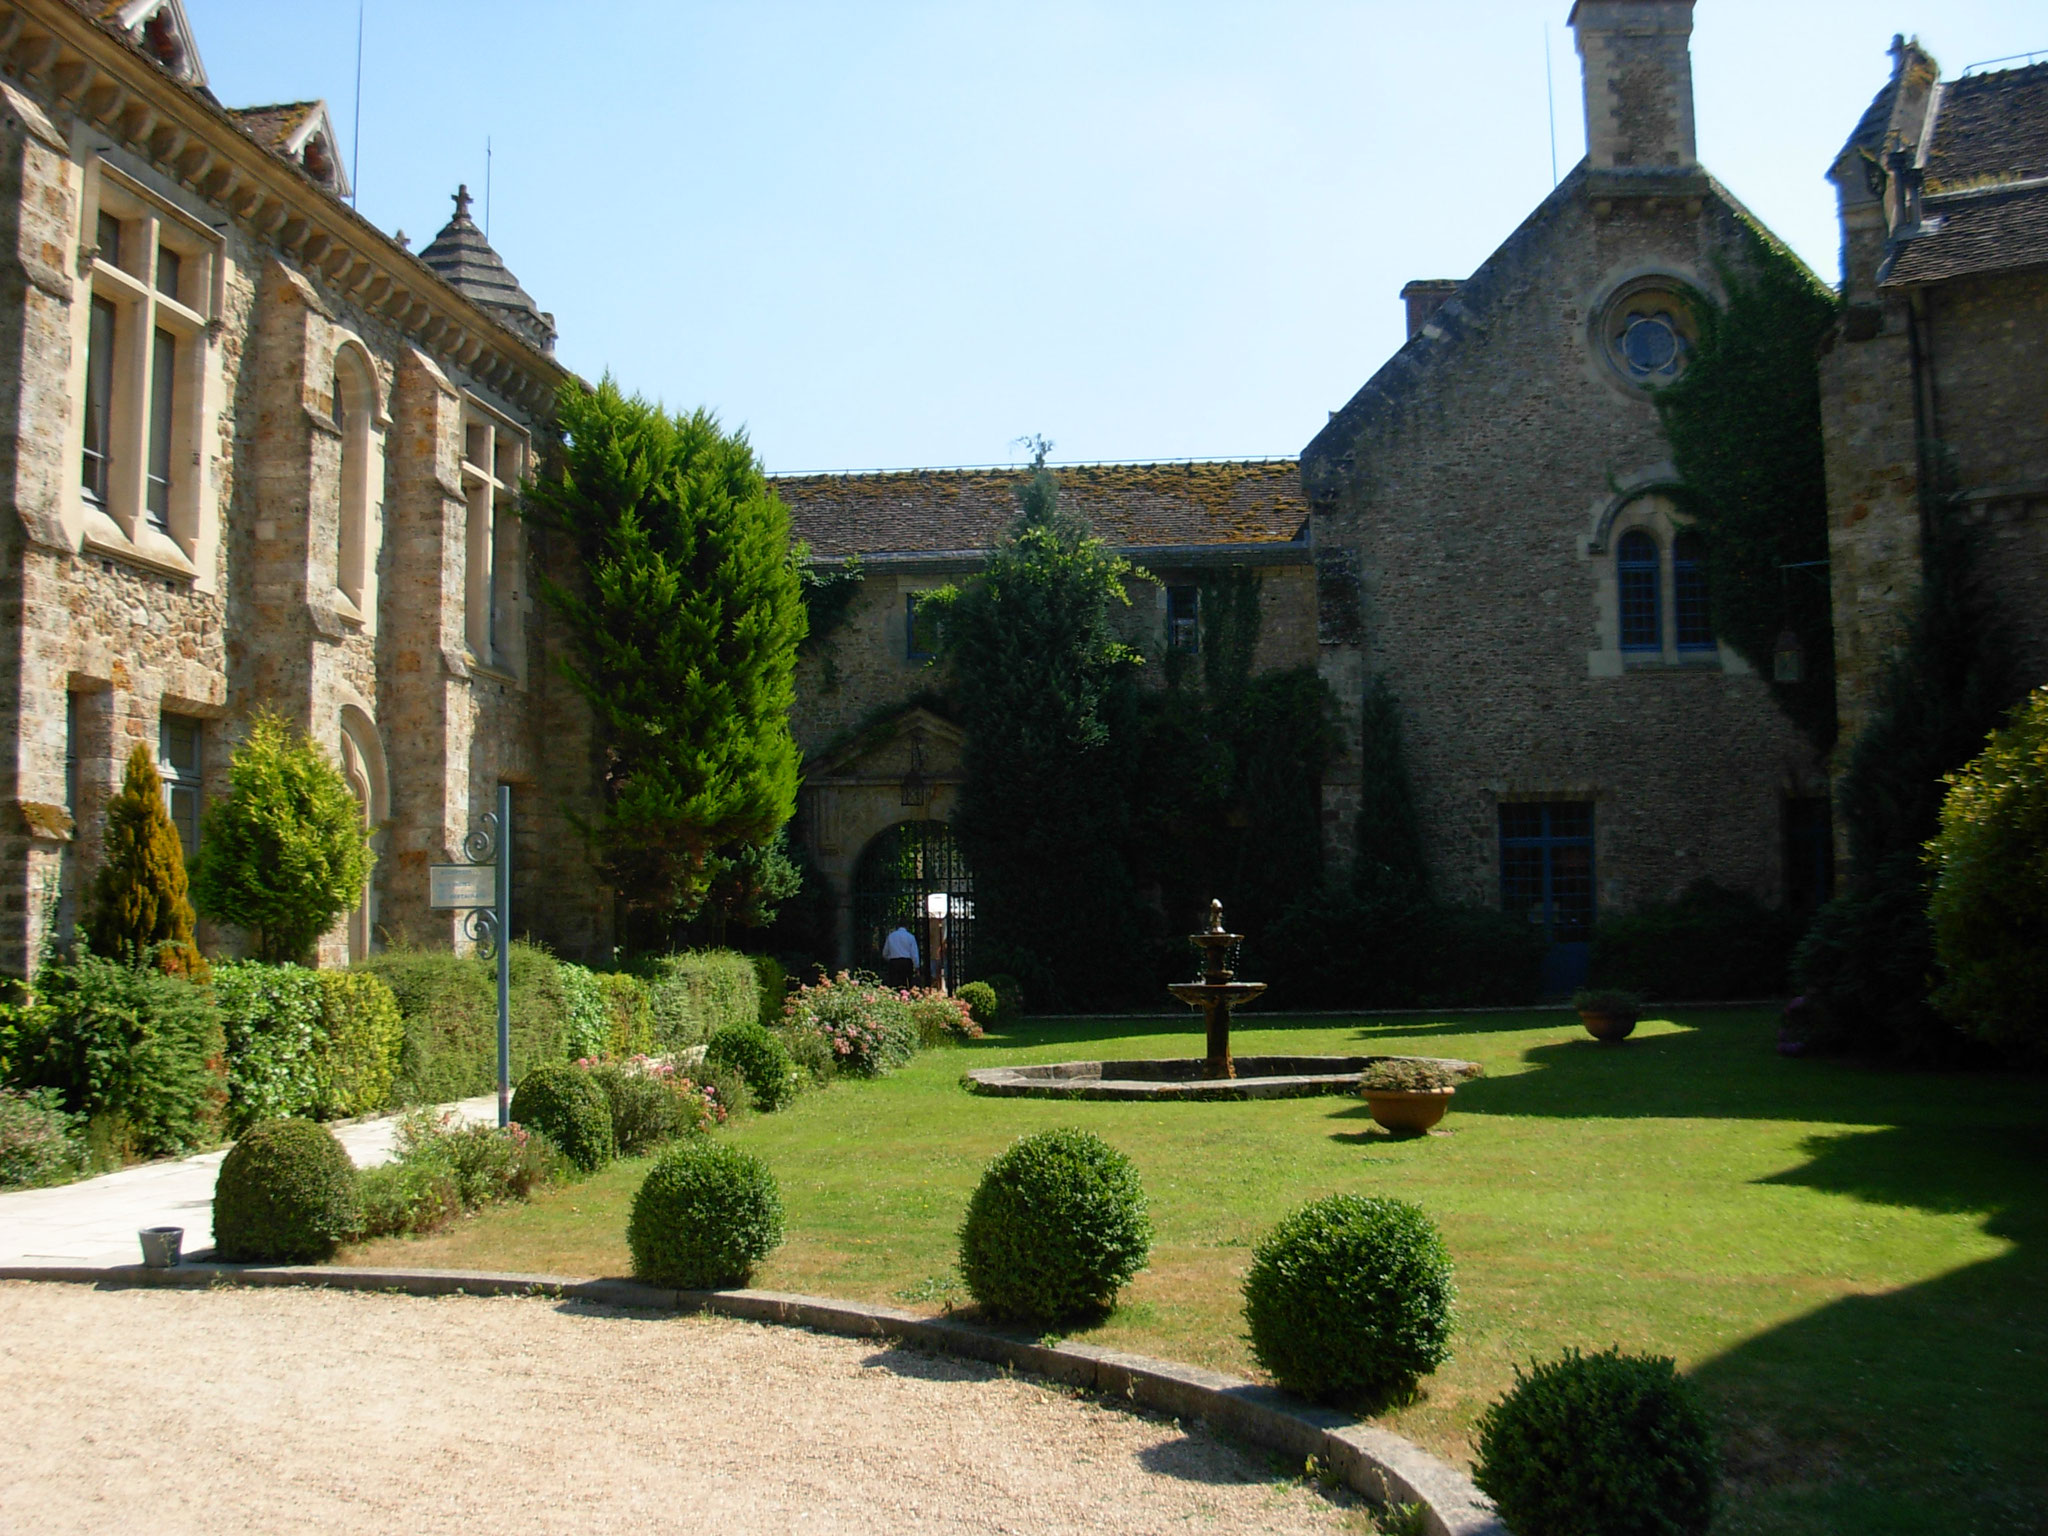 Vaux-de-Cernay abbey